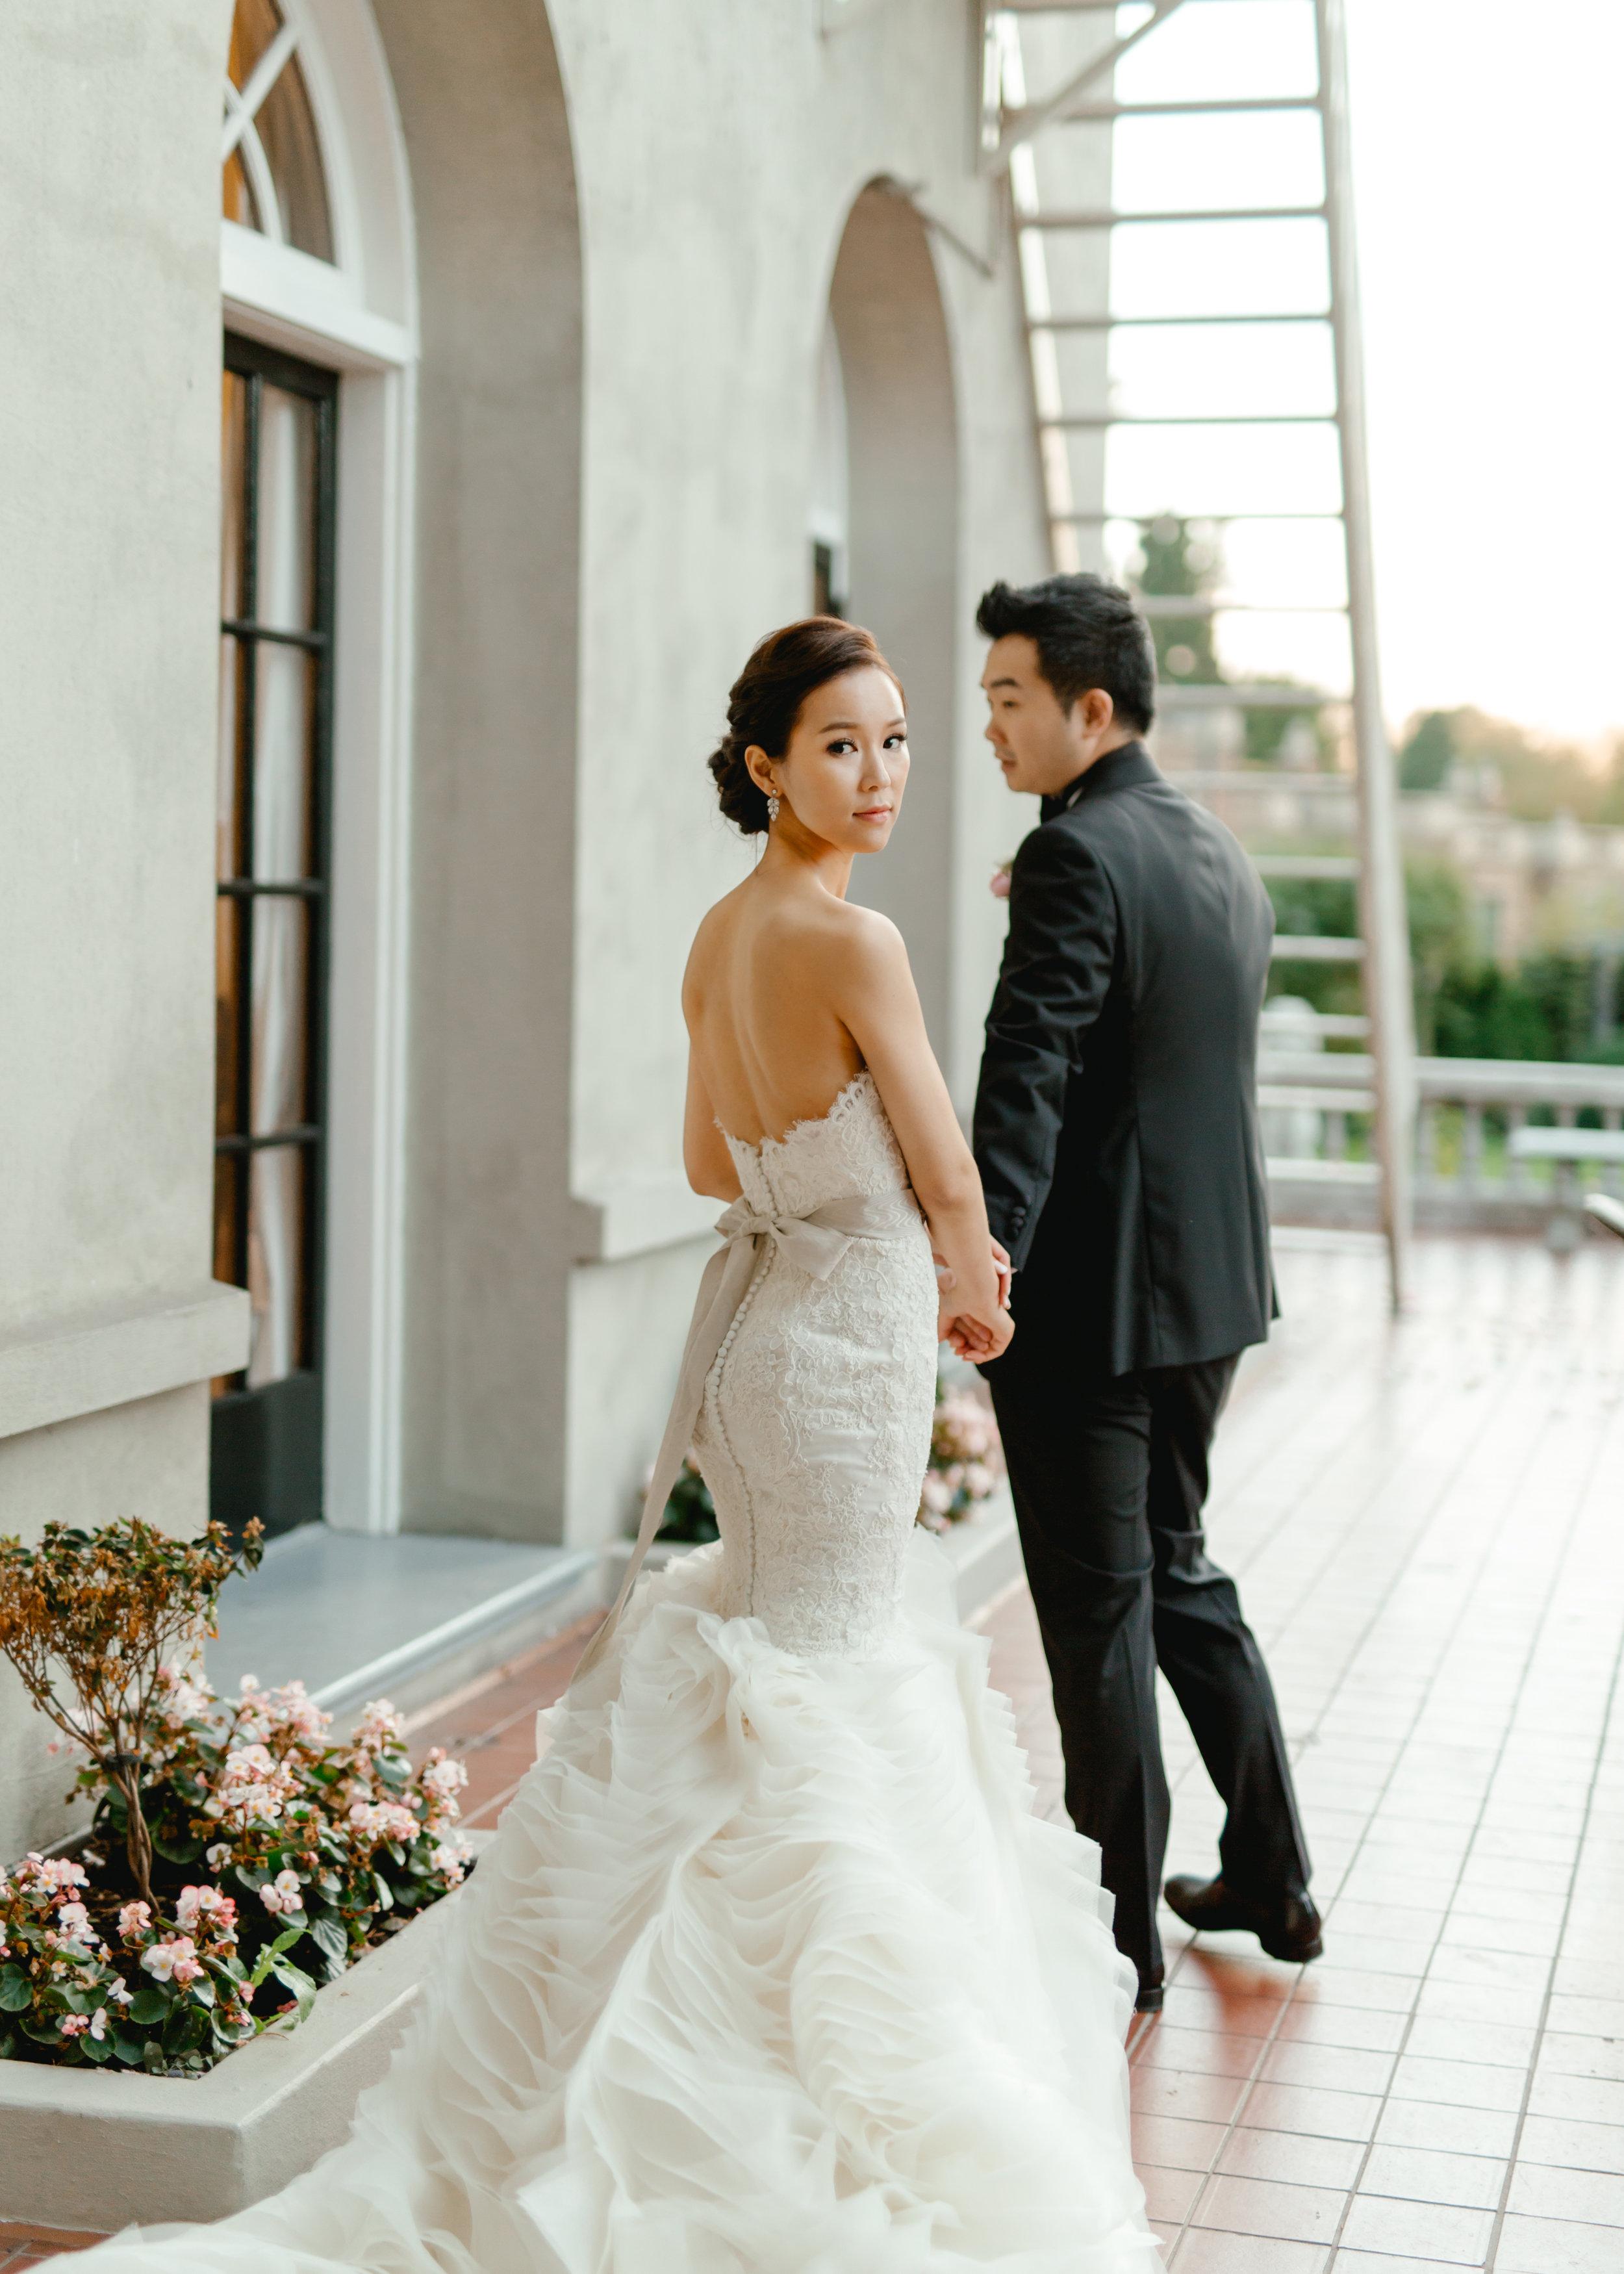 herafilms_wedding_sara_lei_hera_selects-46.jpg